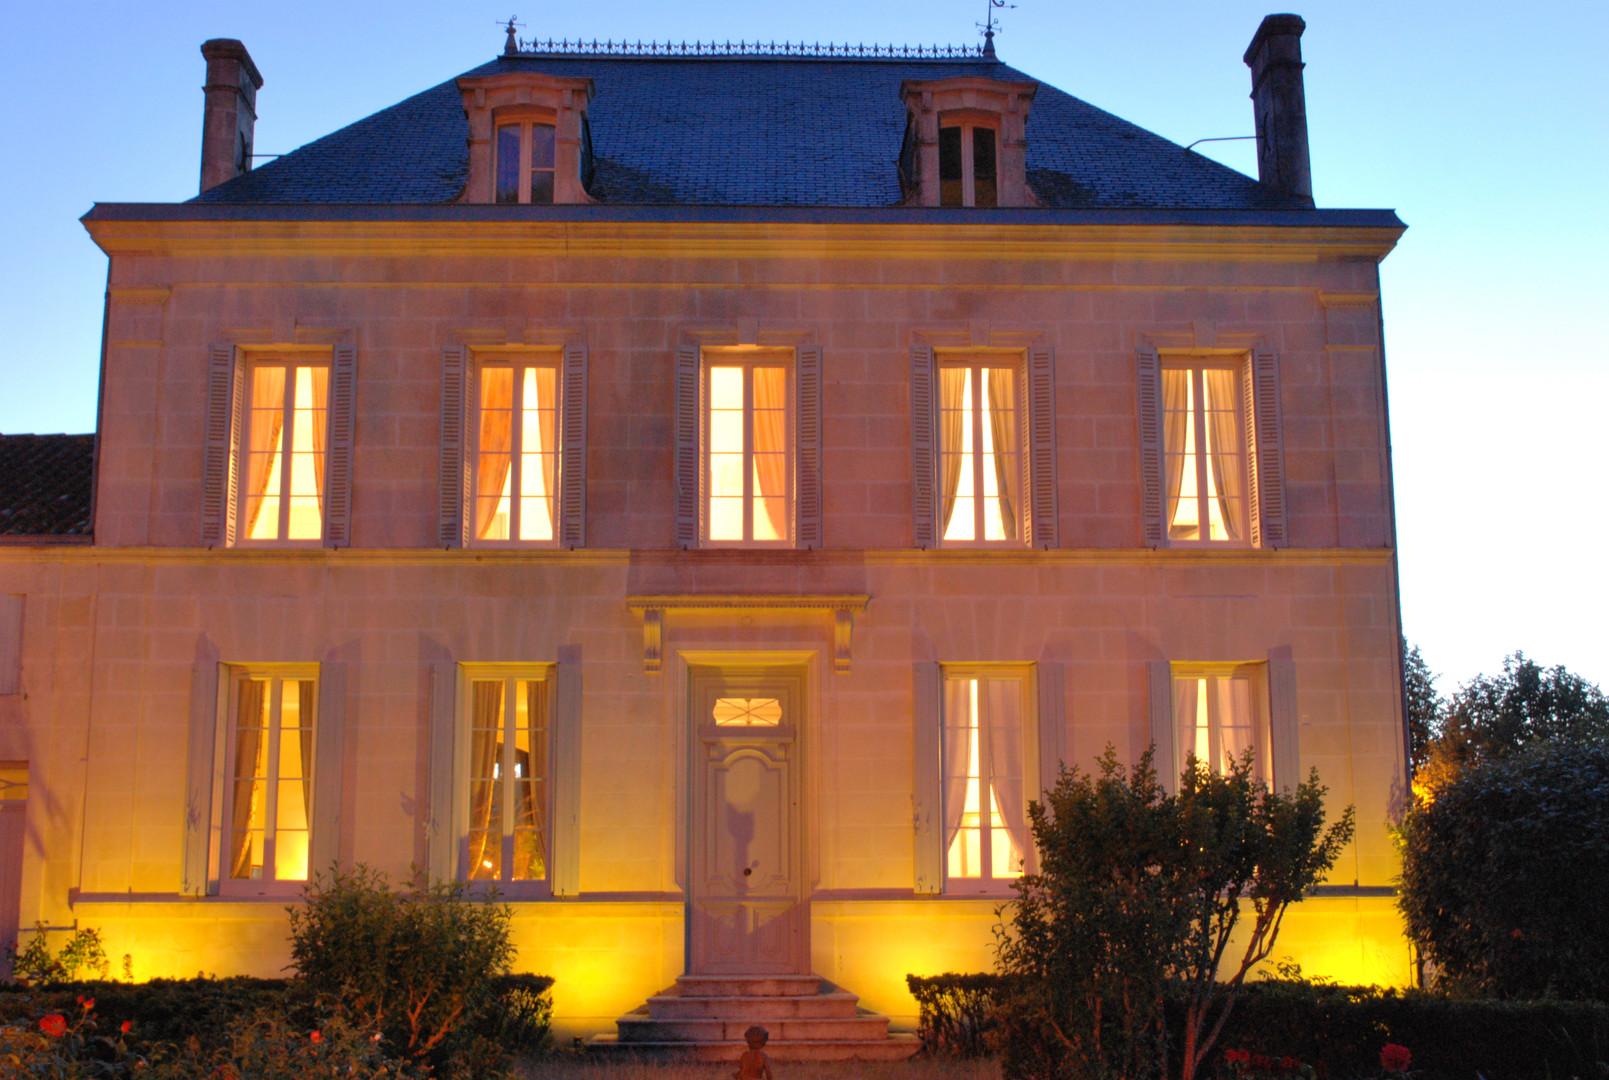 Manor facade in the evening.